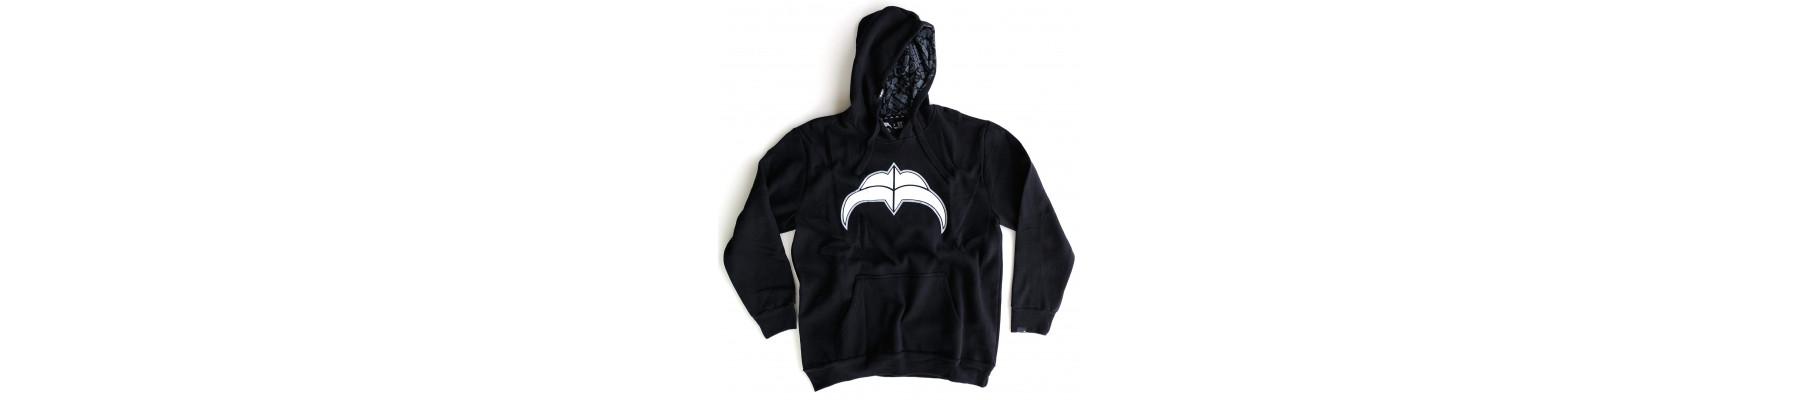 Razors Logo Hoodie Blk